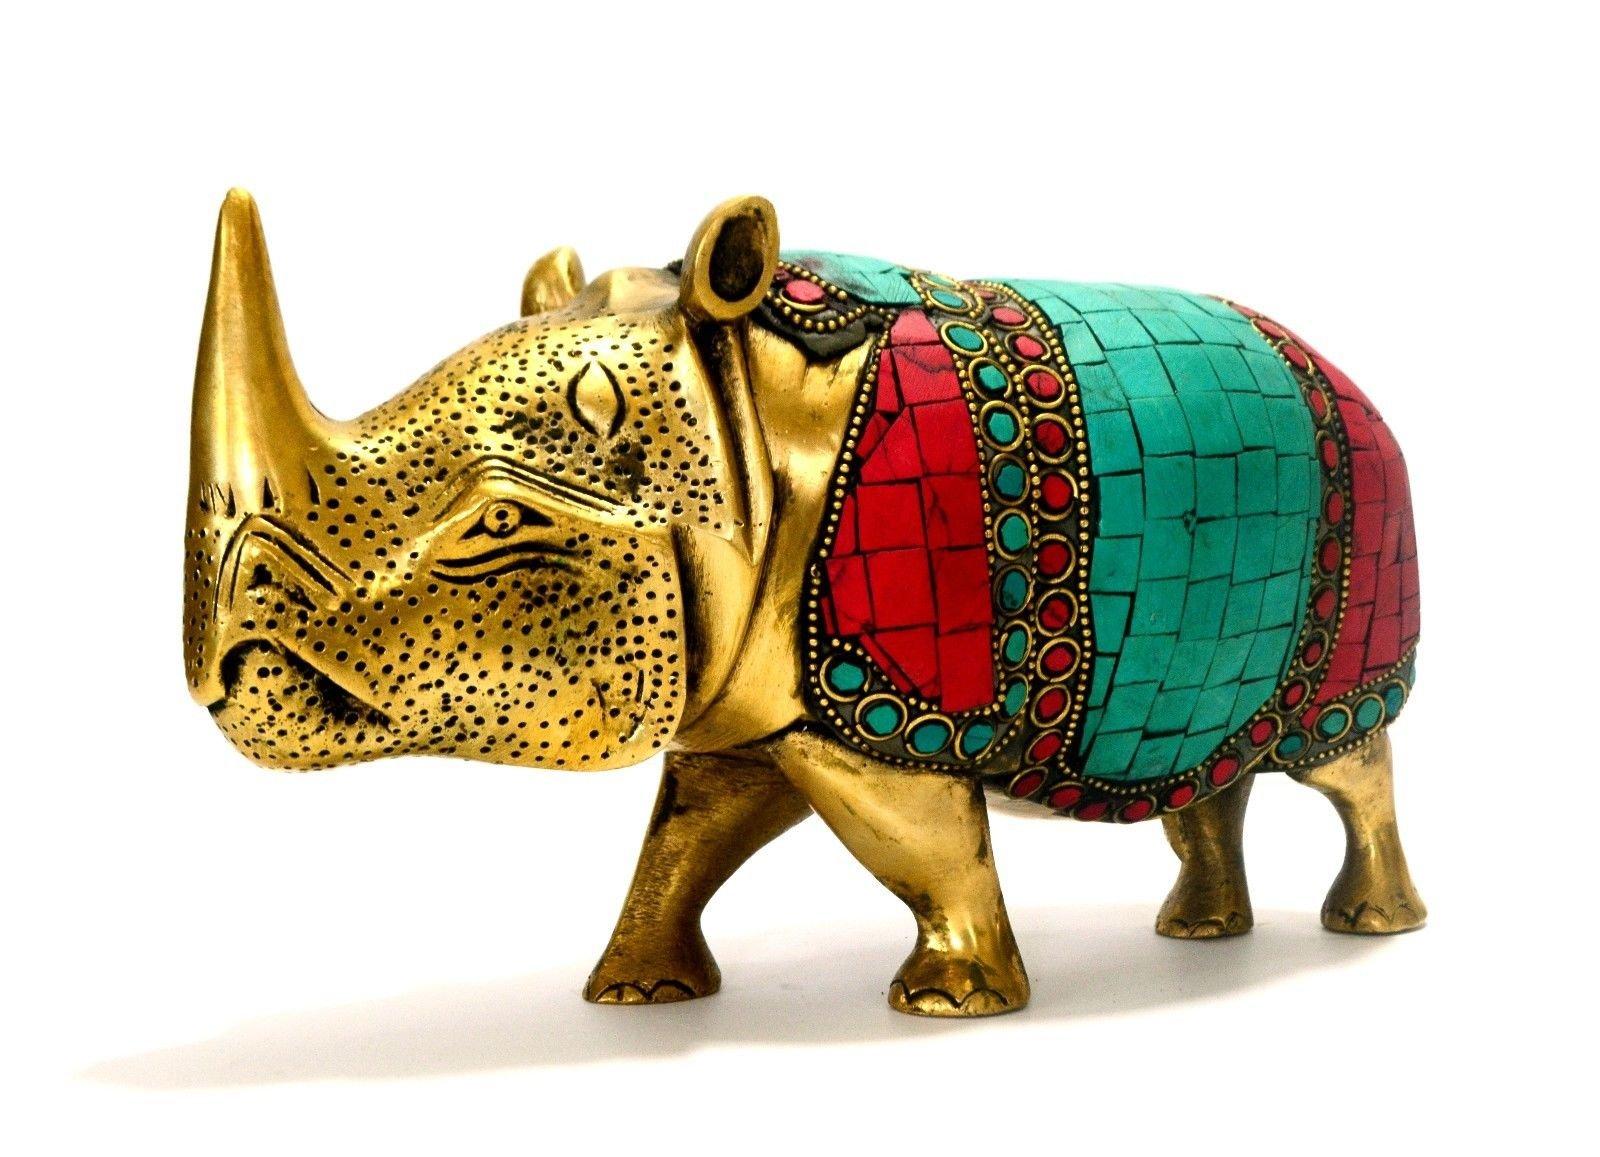 CraftVatika Wild Rhino African Safari Rhinoceros Brass Figurine- Metal Animal Statue Gemstone Artwork